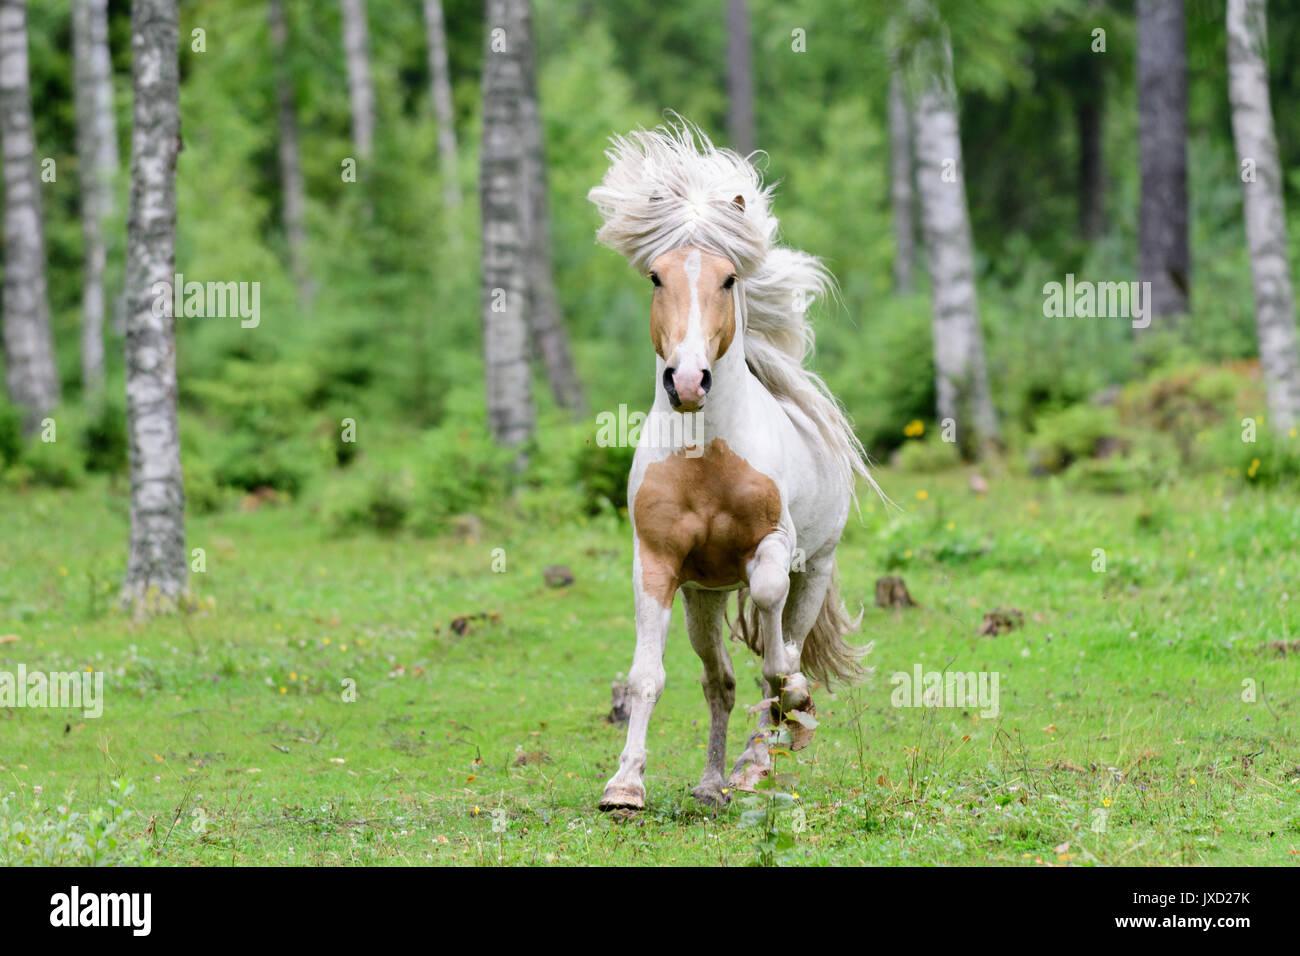 Running Icelandic horse in birch forest in Sweden - Stock Image